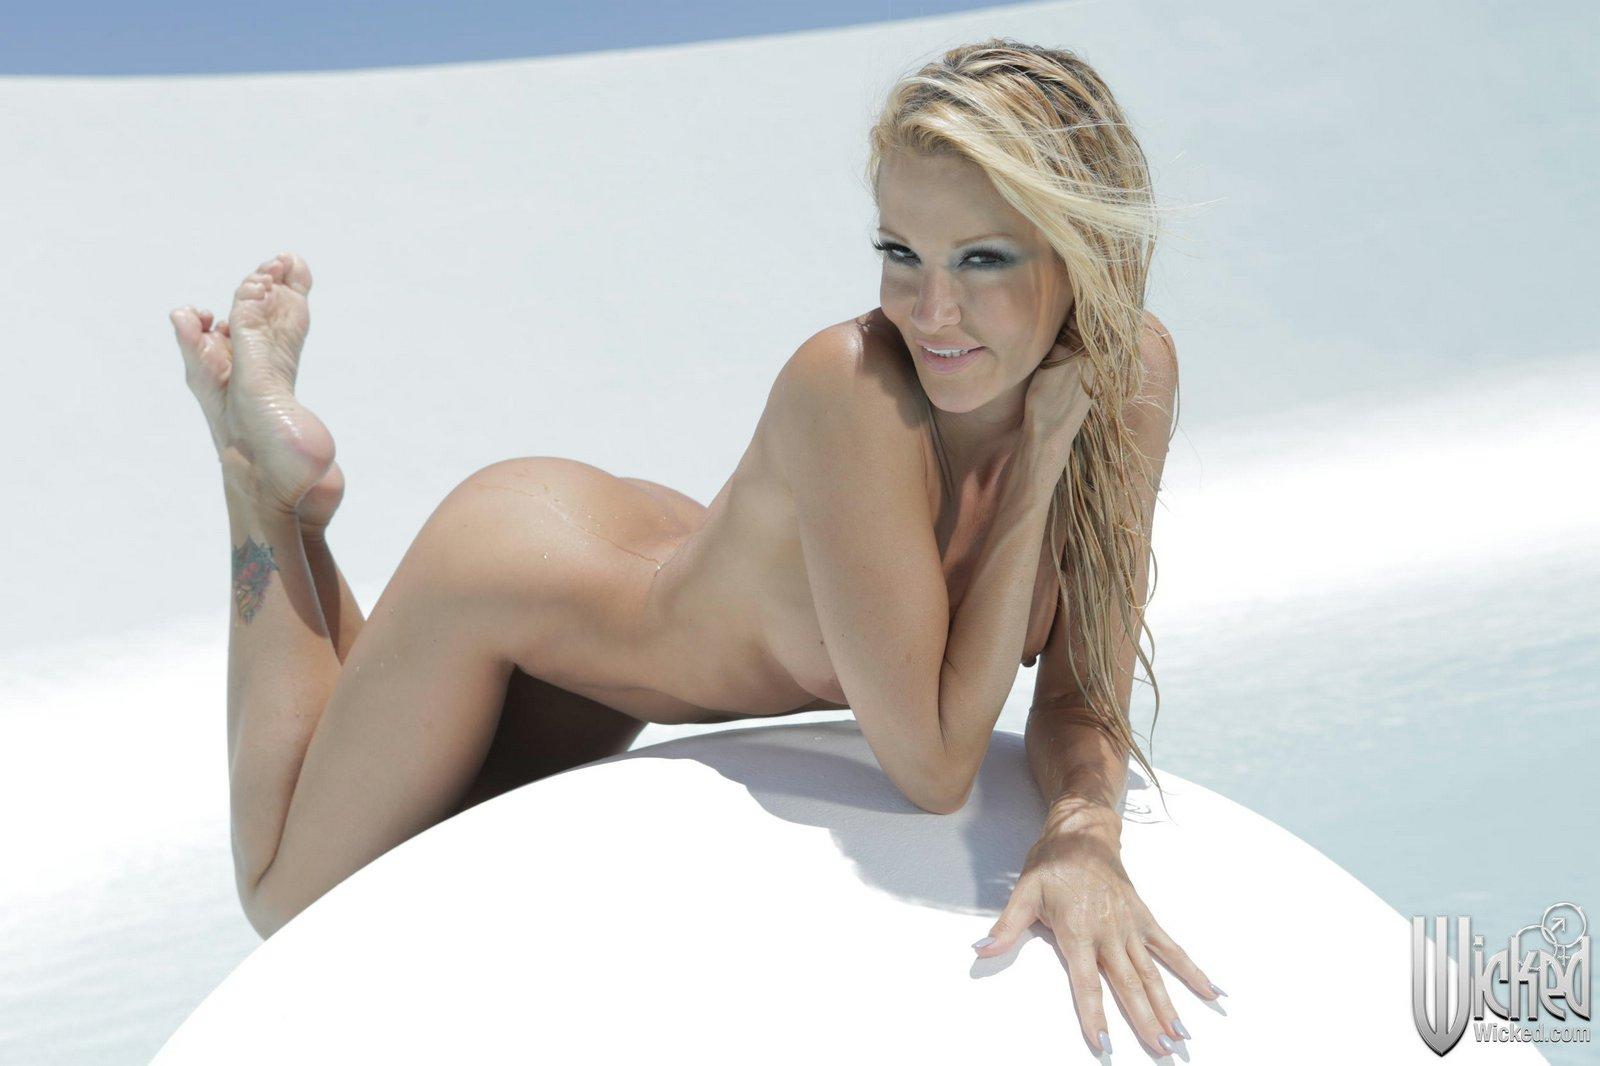 Mocha uson nude photos